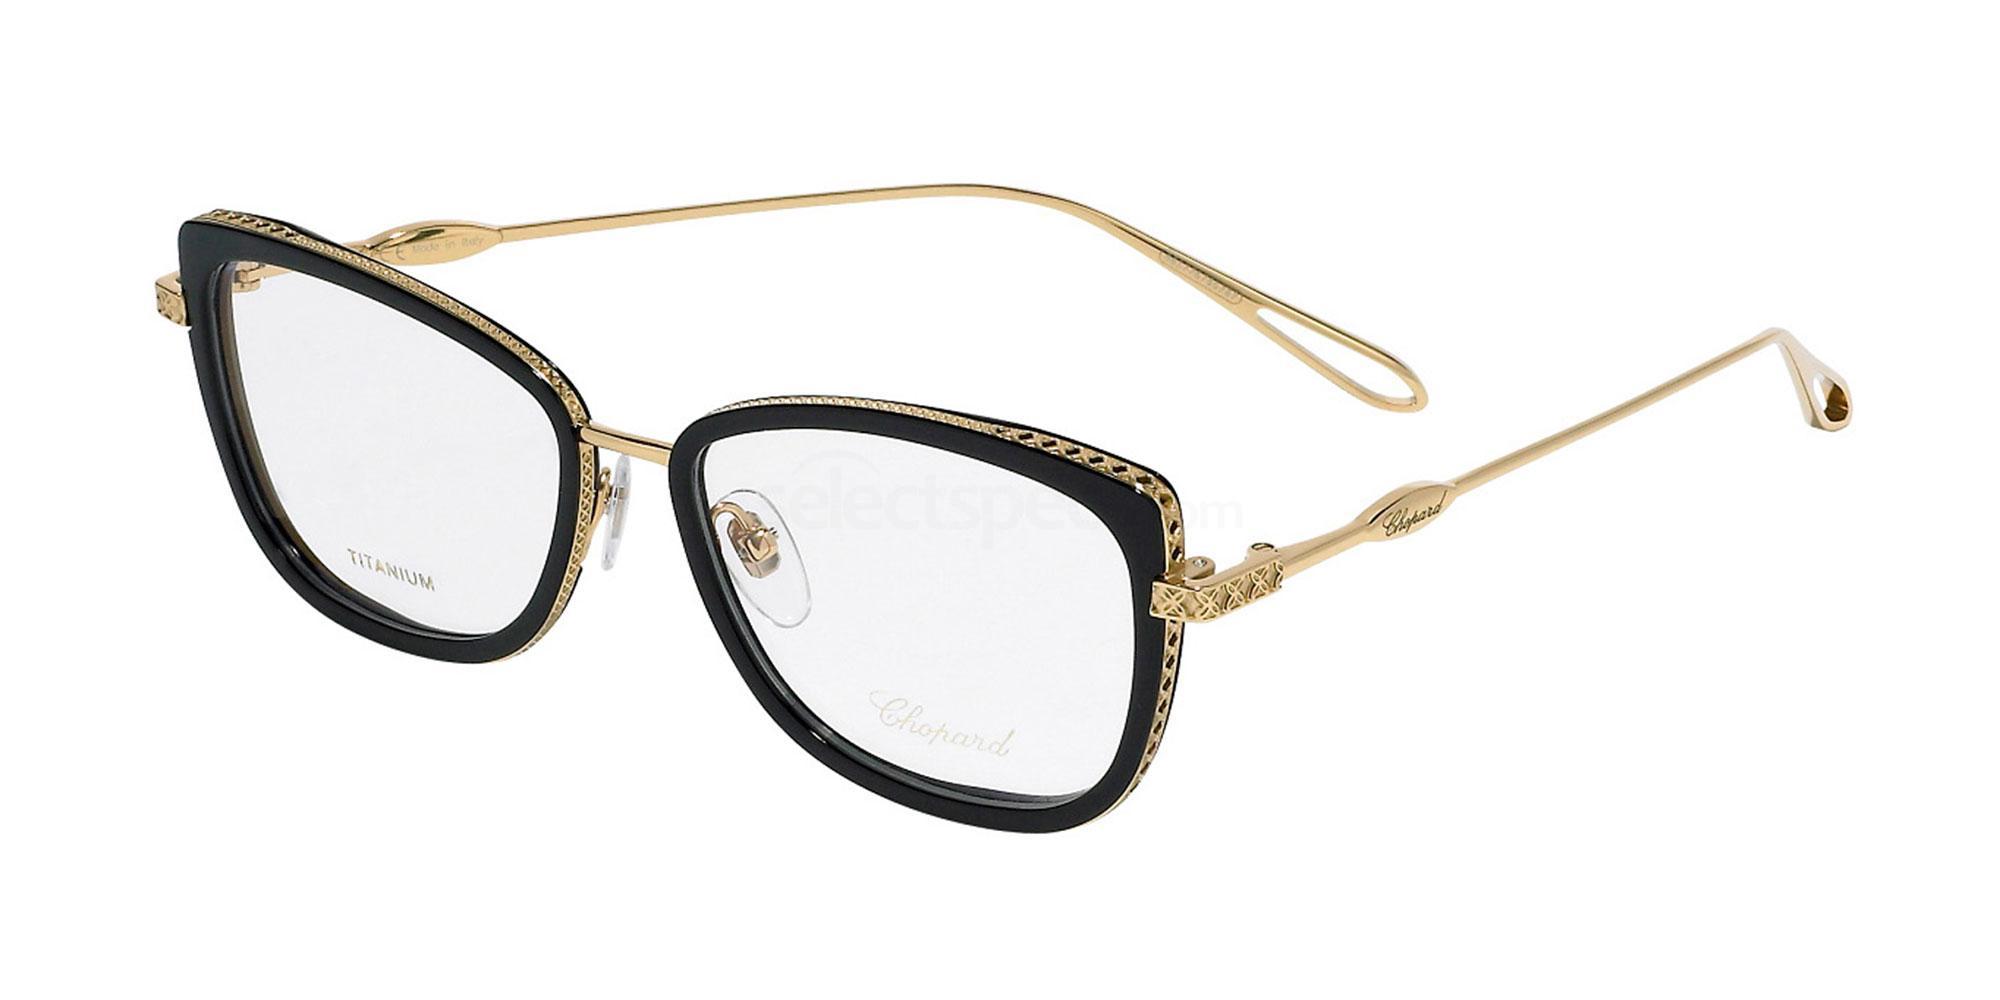 0300 VCH256M Glasses, Chopard